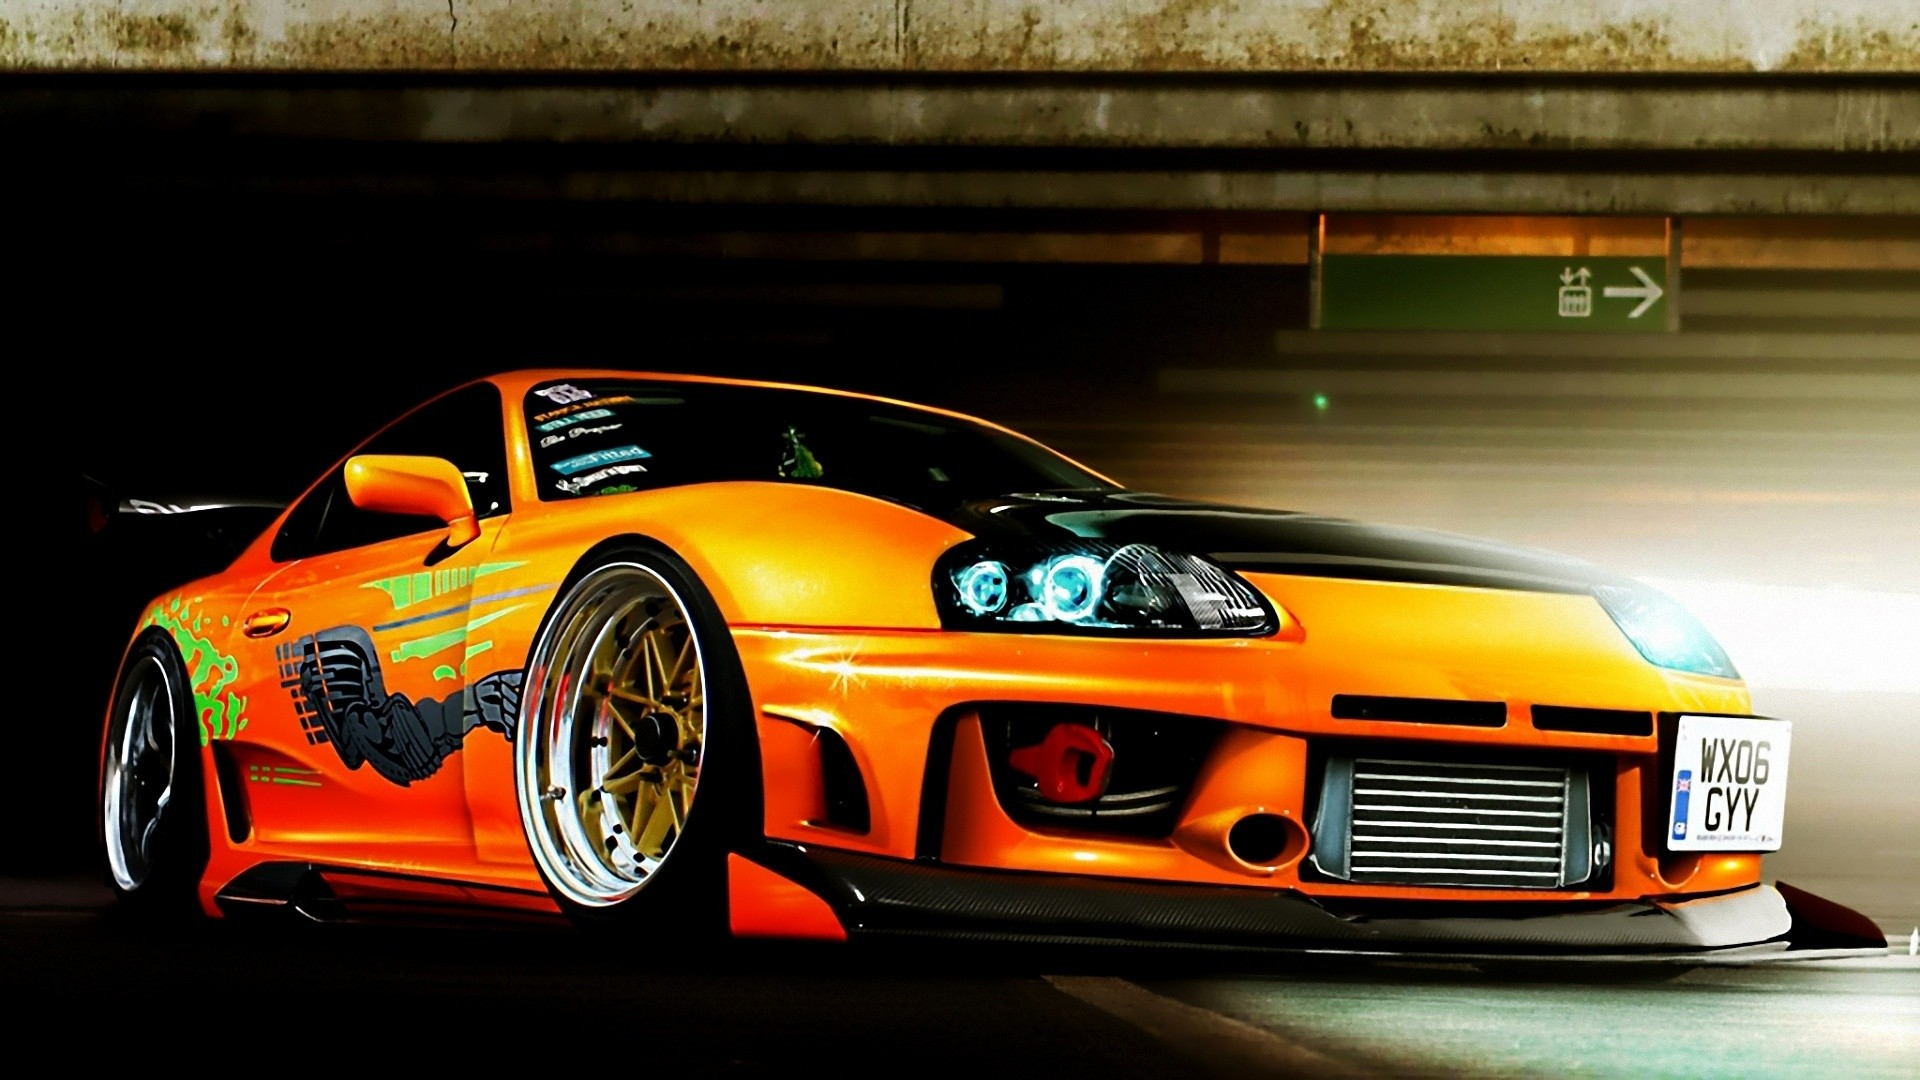 Neon Lights Cars